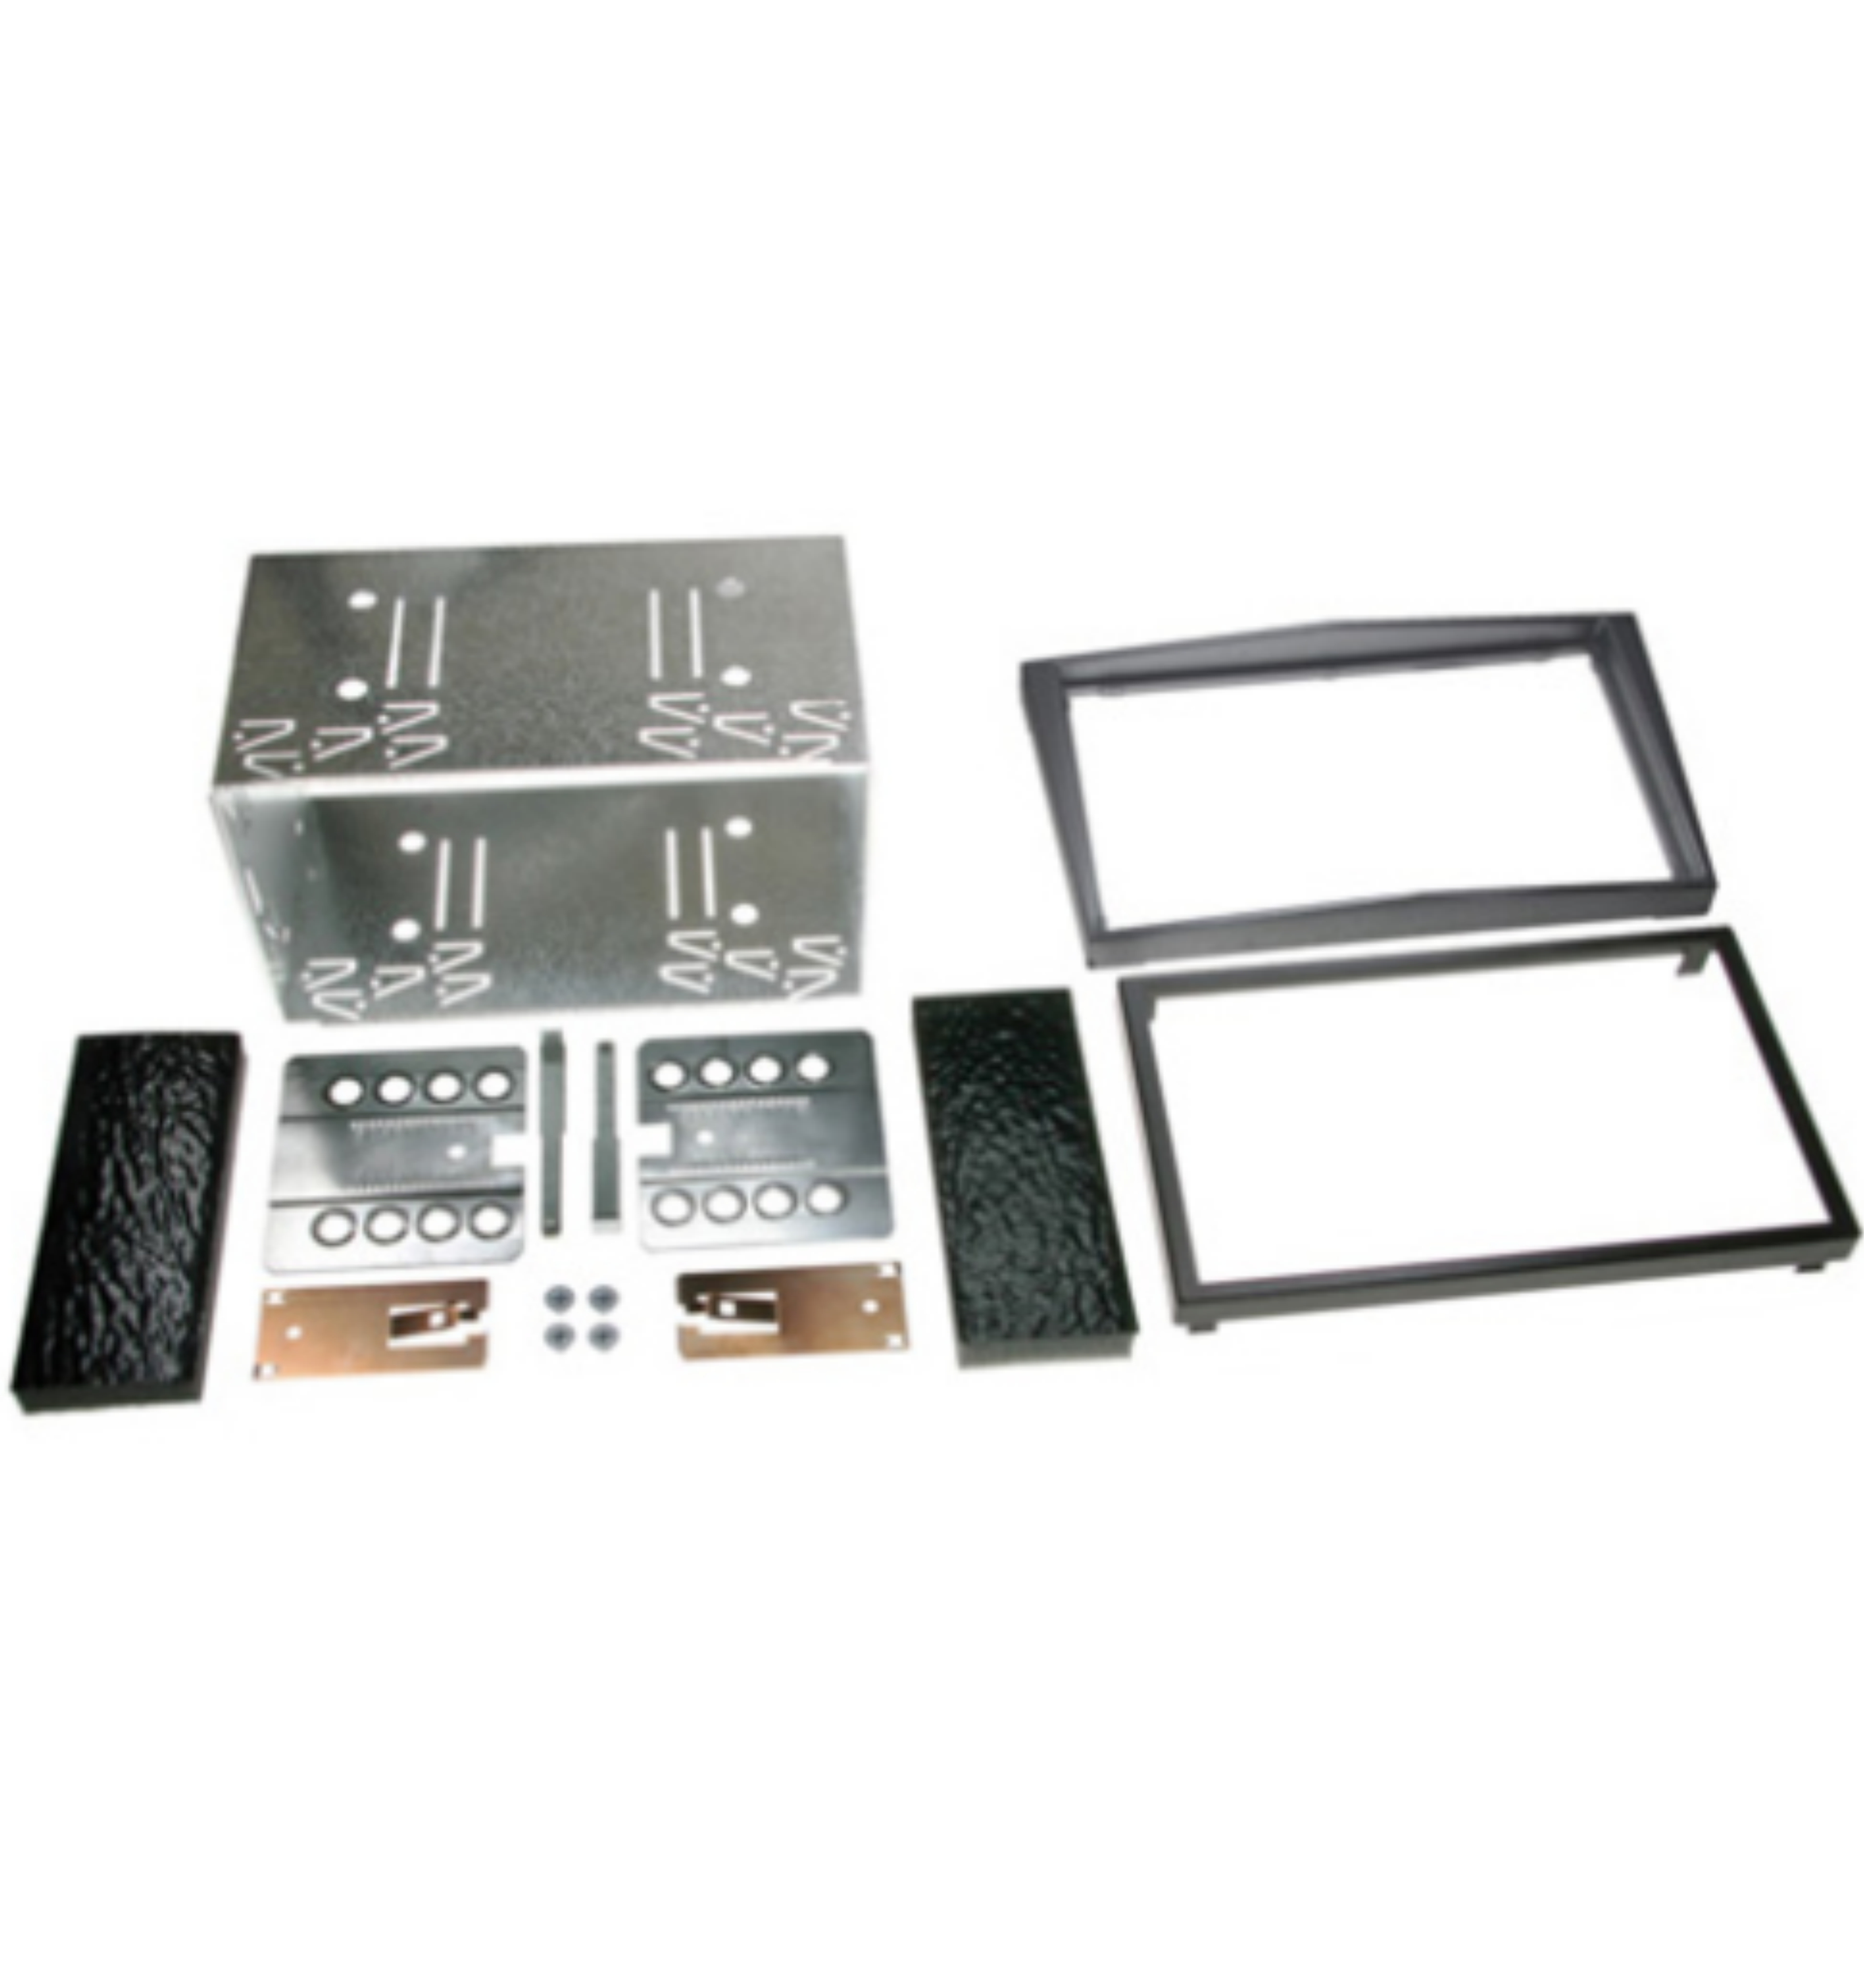 C2 23VX04 Car Stereo Double Din Fascia Plate Adaptor  Vauxhall Zafira/Antara/Tig